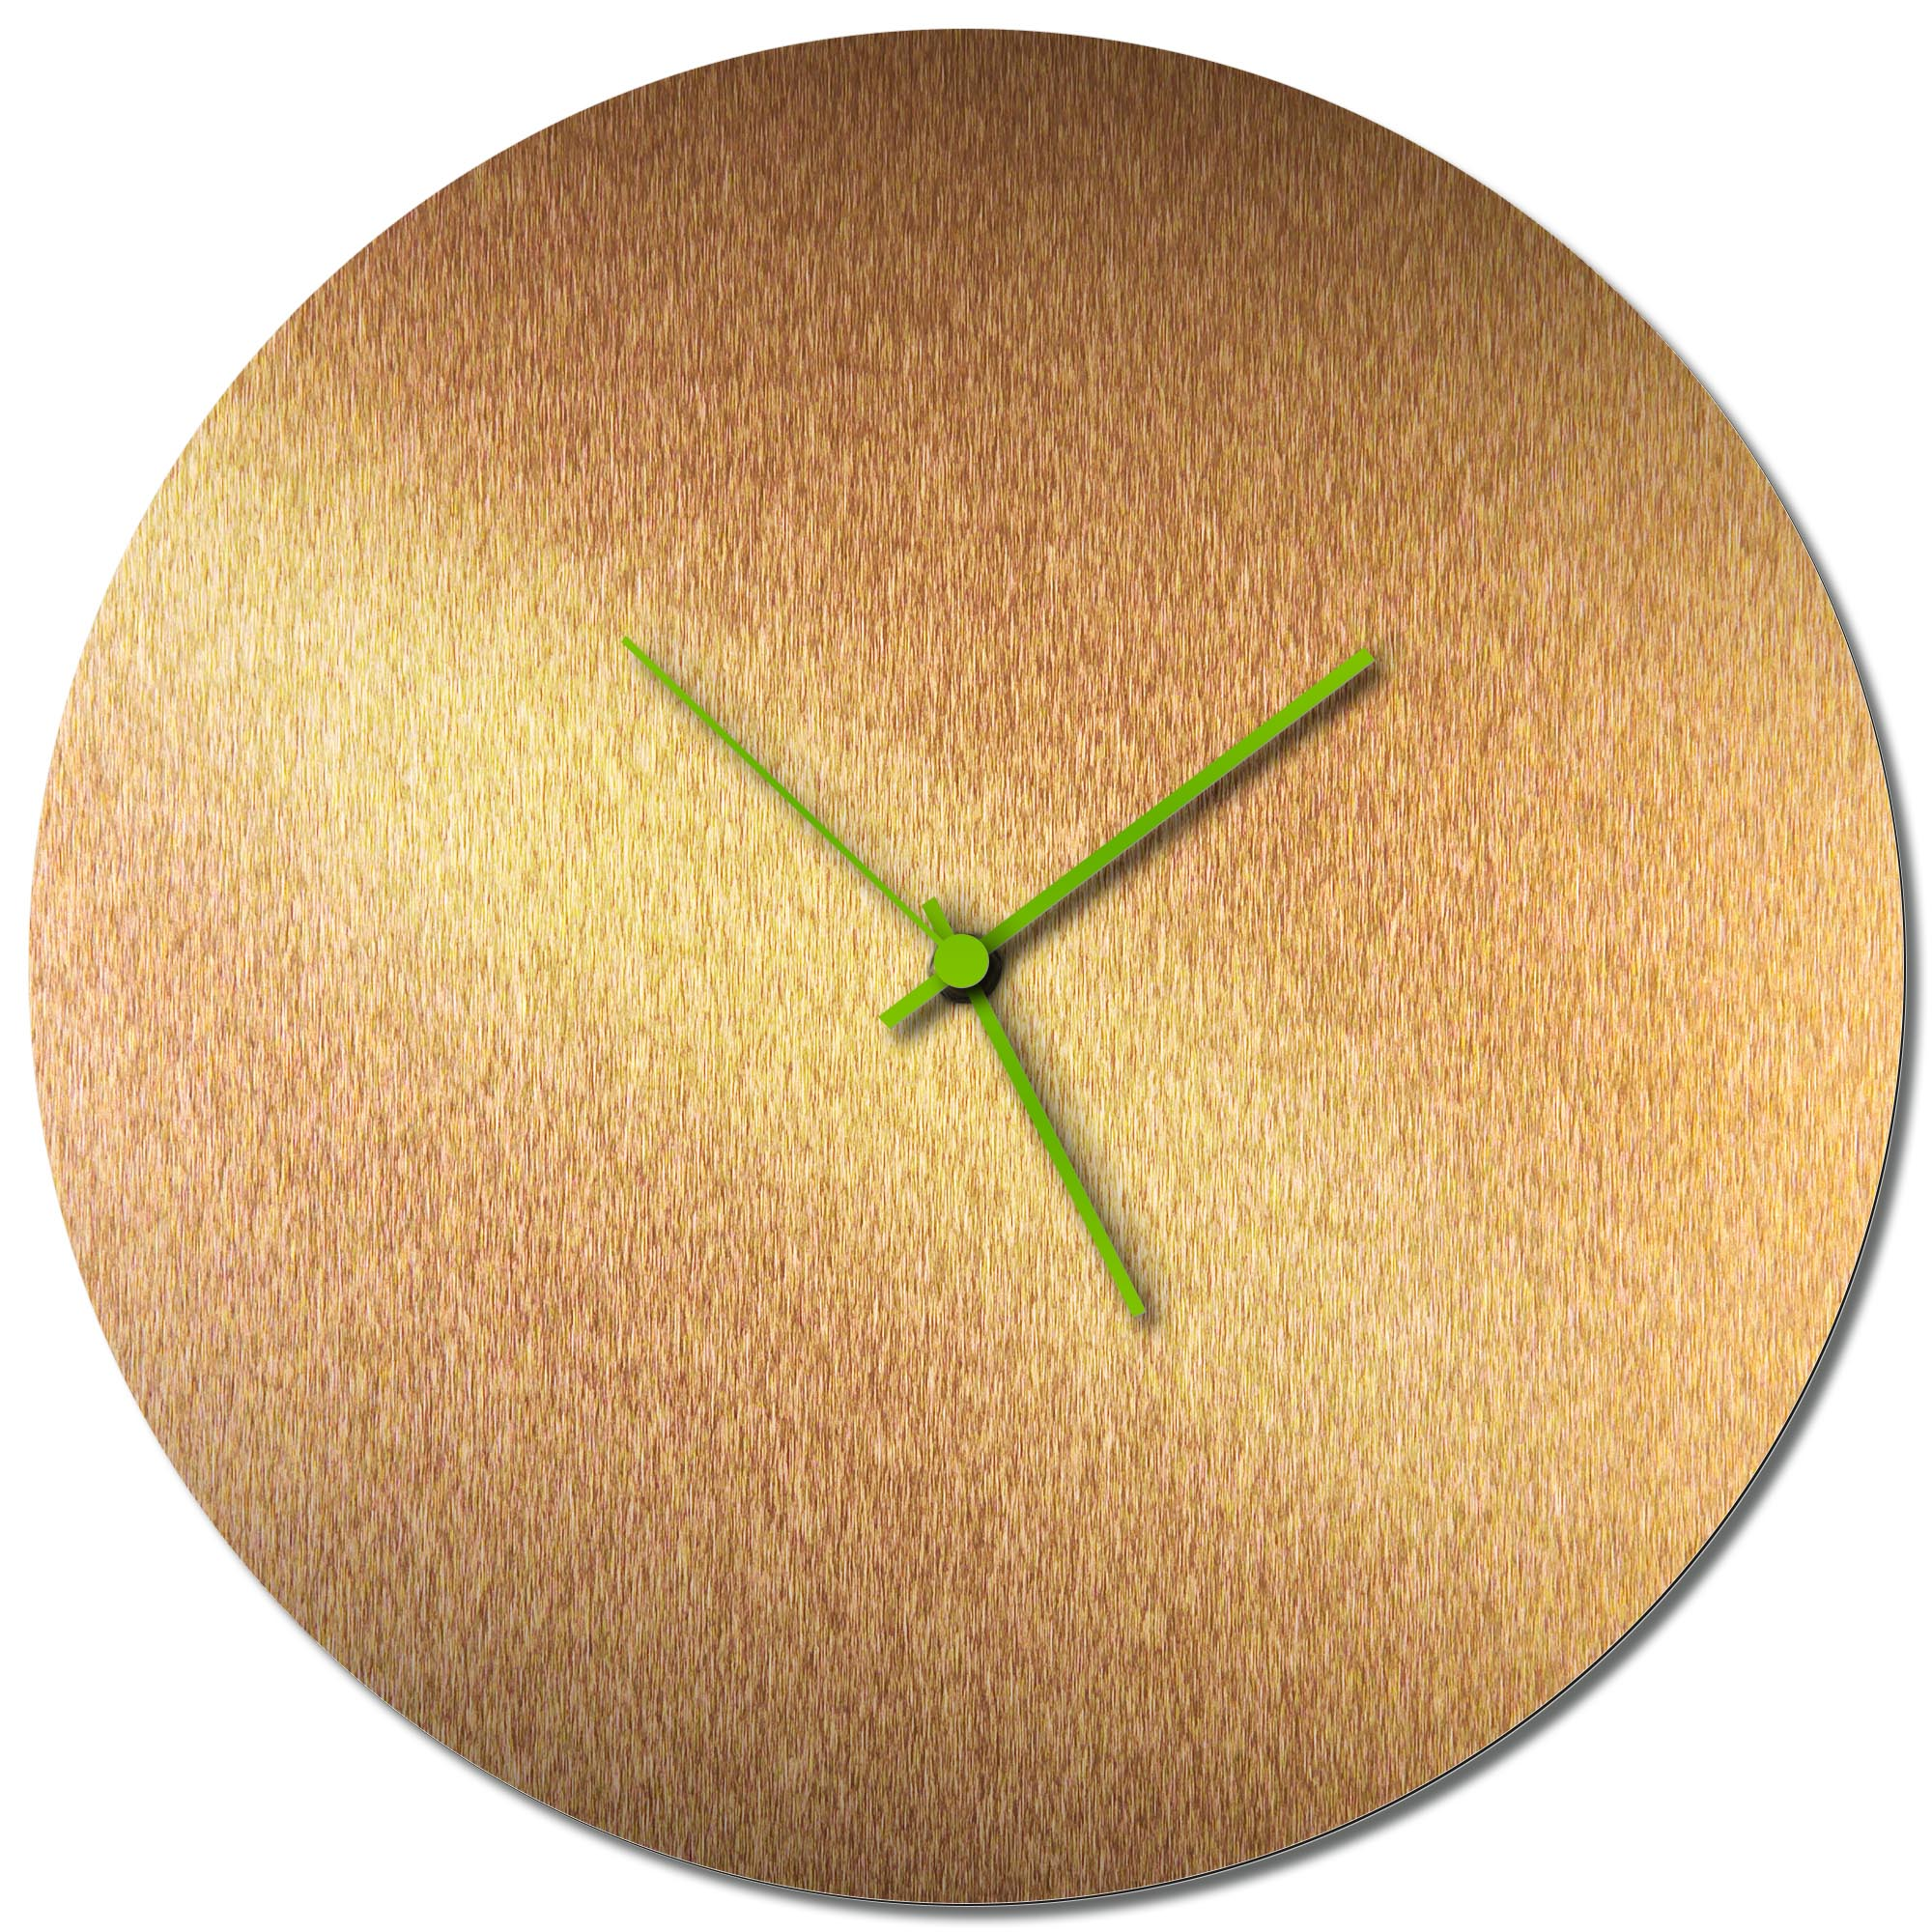 Adam Schwoeppe 'Bronzesmith Circle Clock Green' Midcentury Modern Style Wall Clock